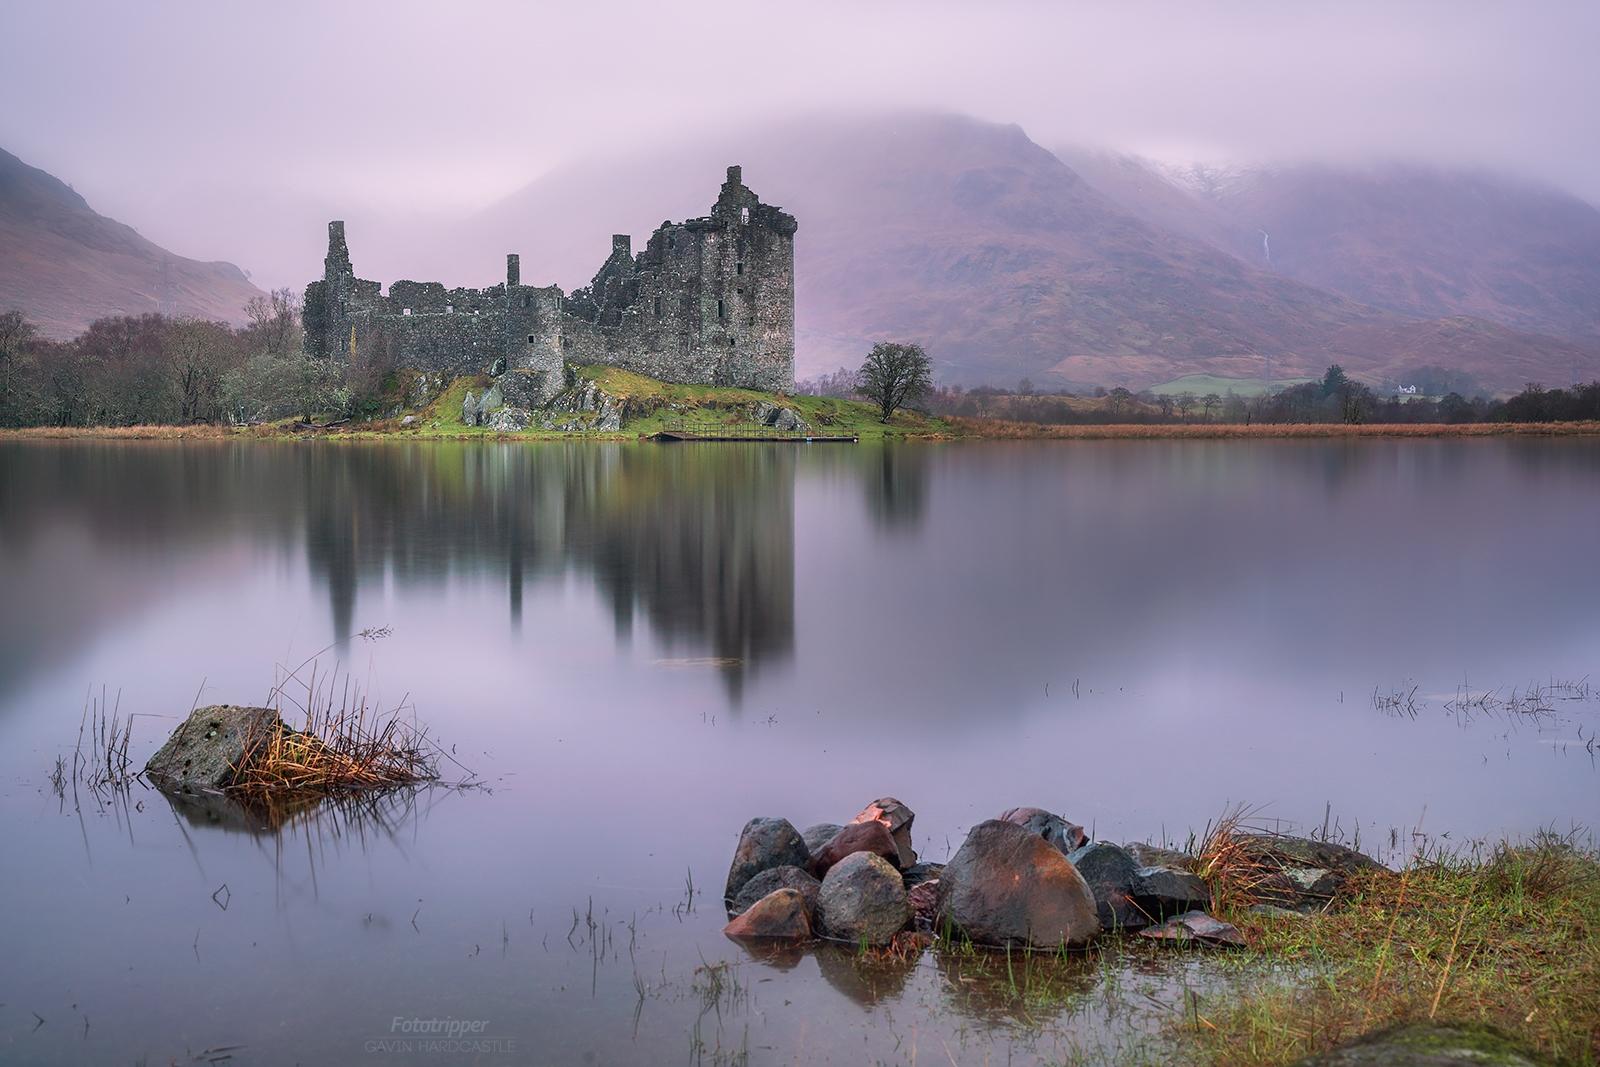 The Curse of Braeburn Castle by Karen Baugh Menuhin